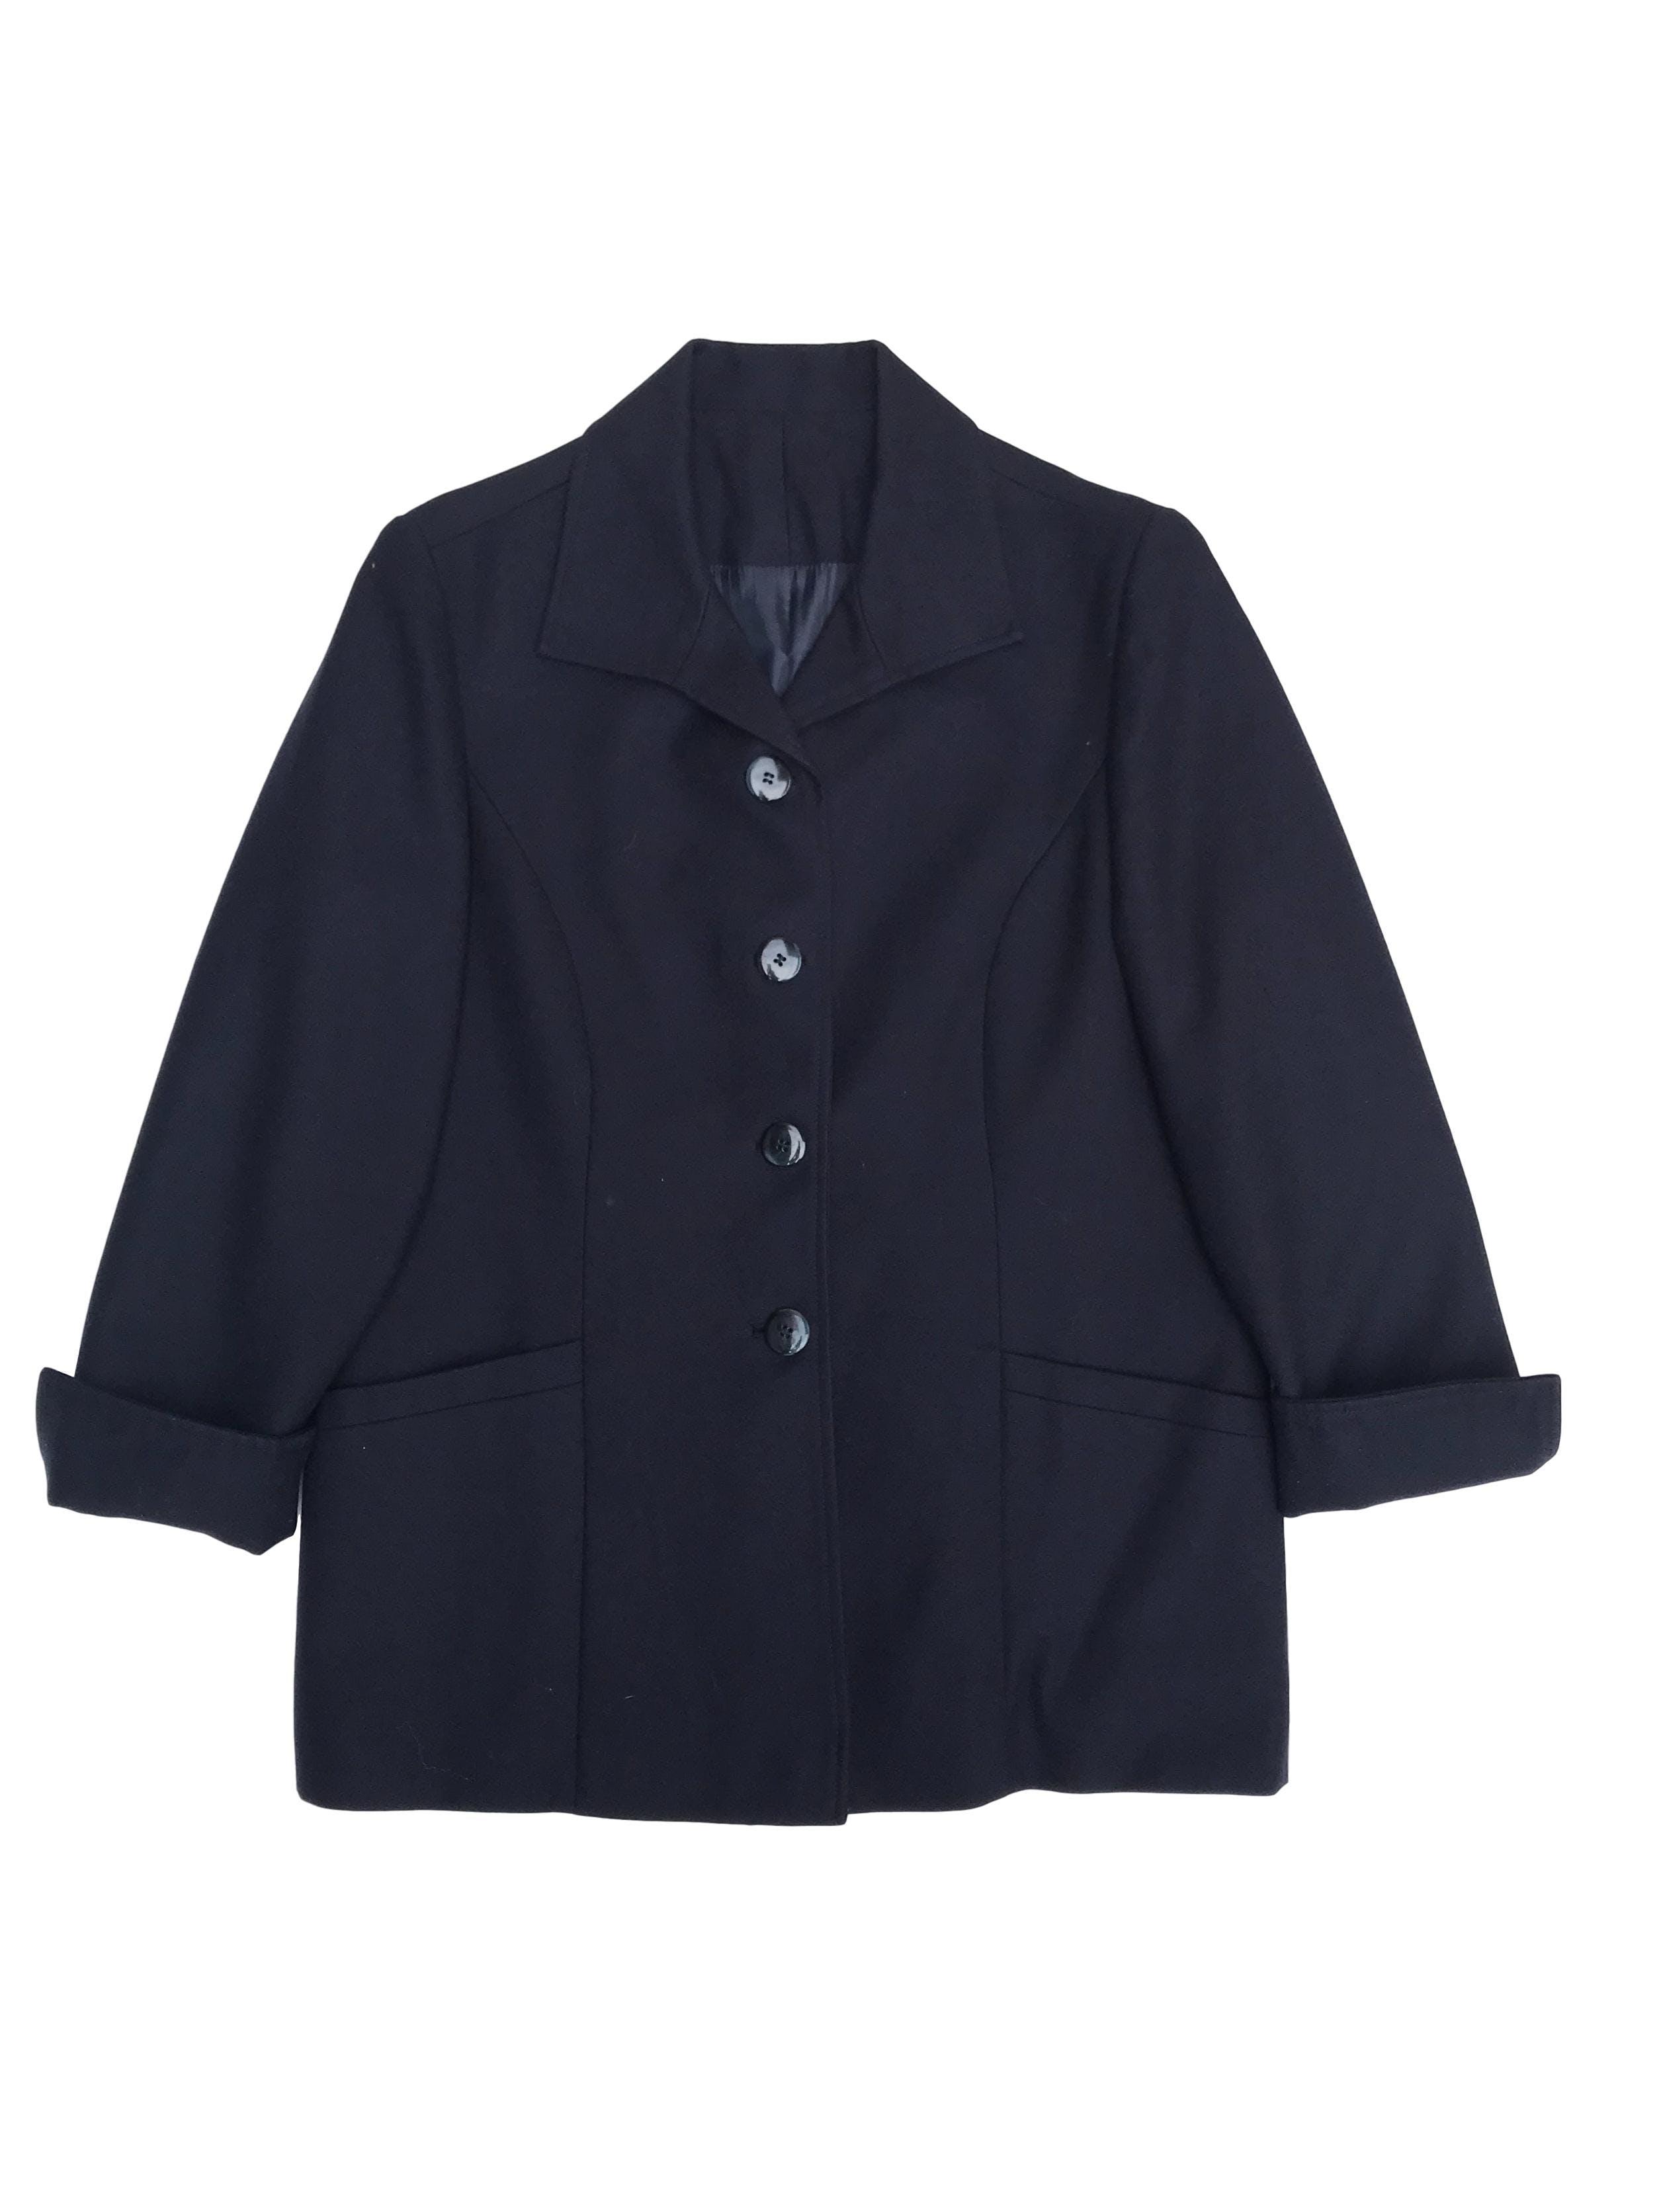 Saco tipo paño azul forrado con botones delanteros, manga 3/4 con dobladillo y botón. Largo 67cm